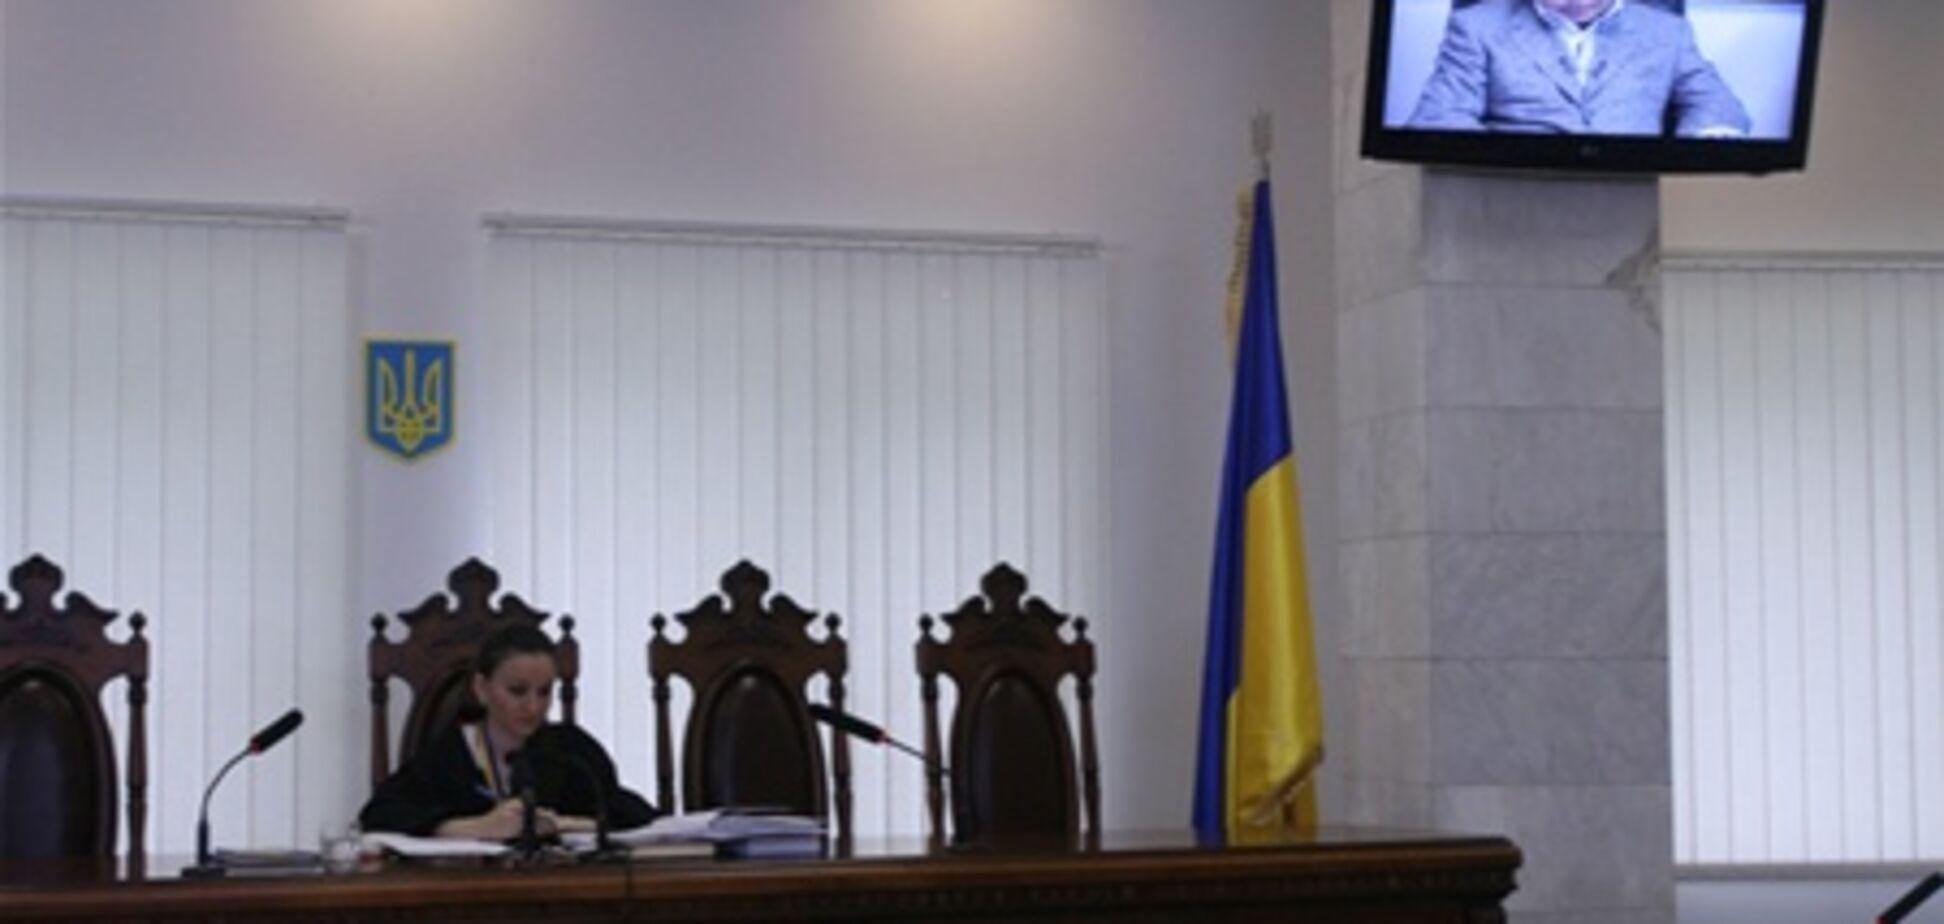 Радник Лазаренко свідчив проти Тимошенко з США